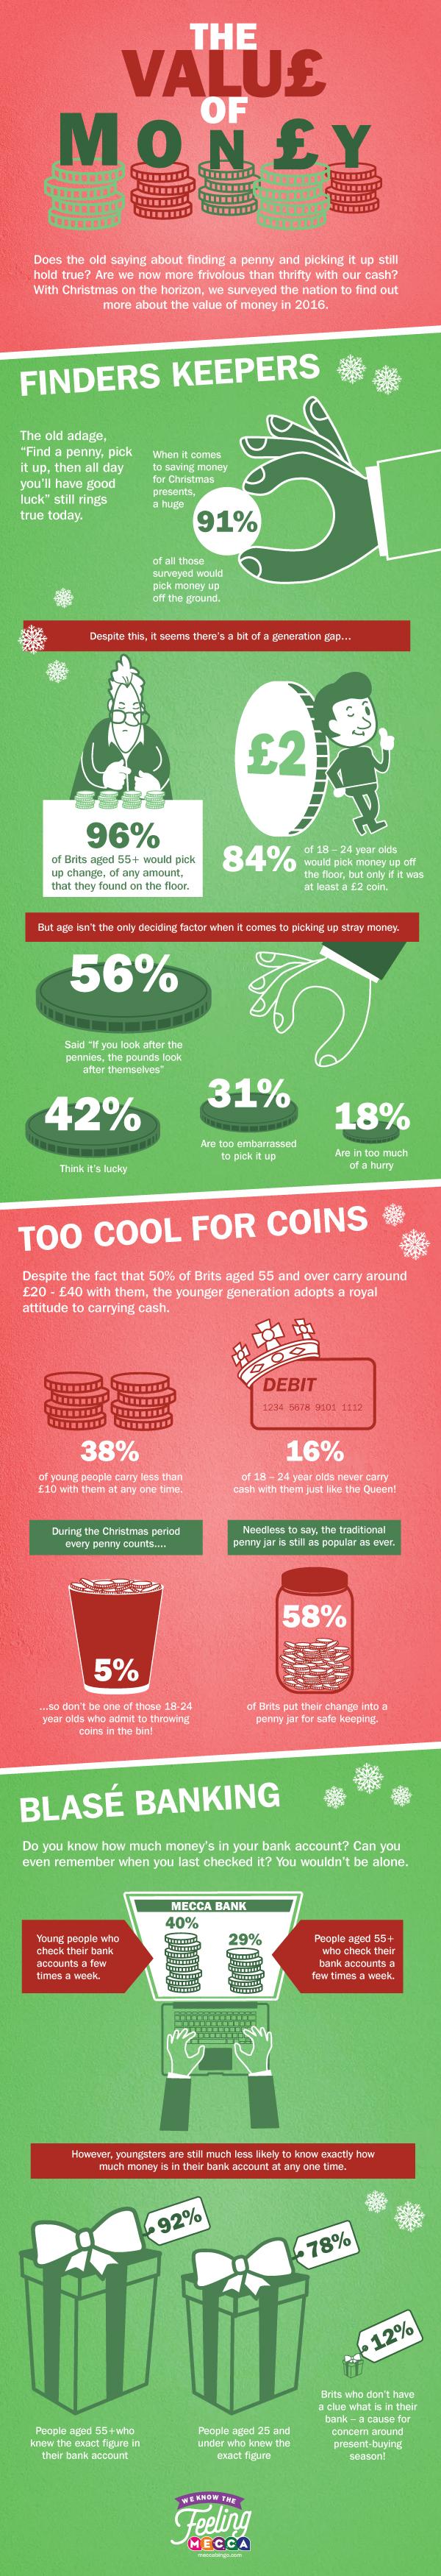 Value of Money infographic